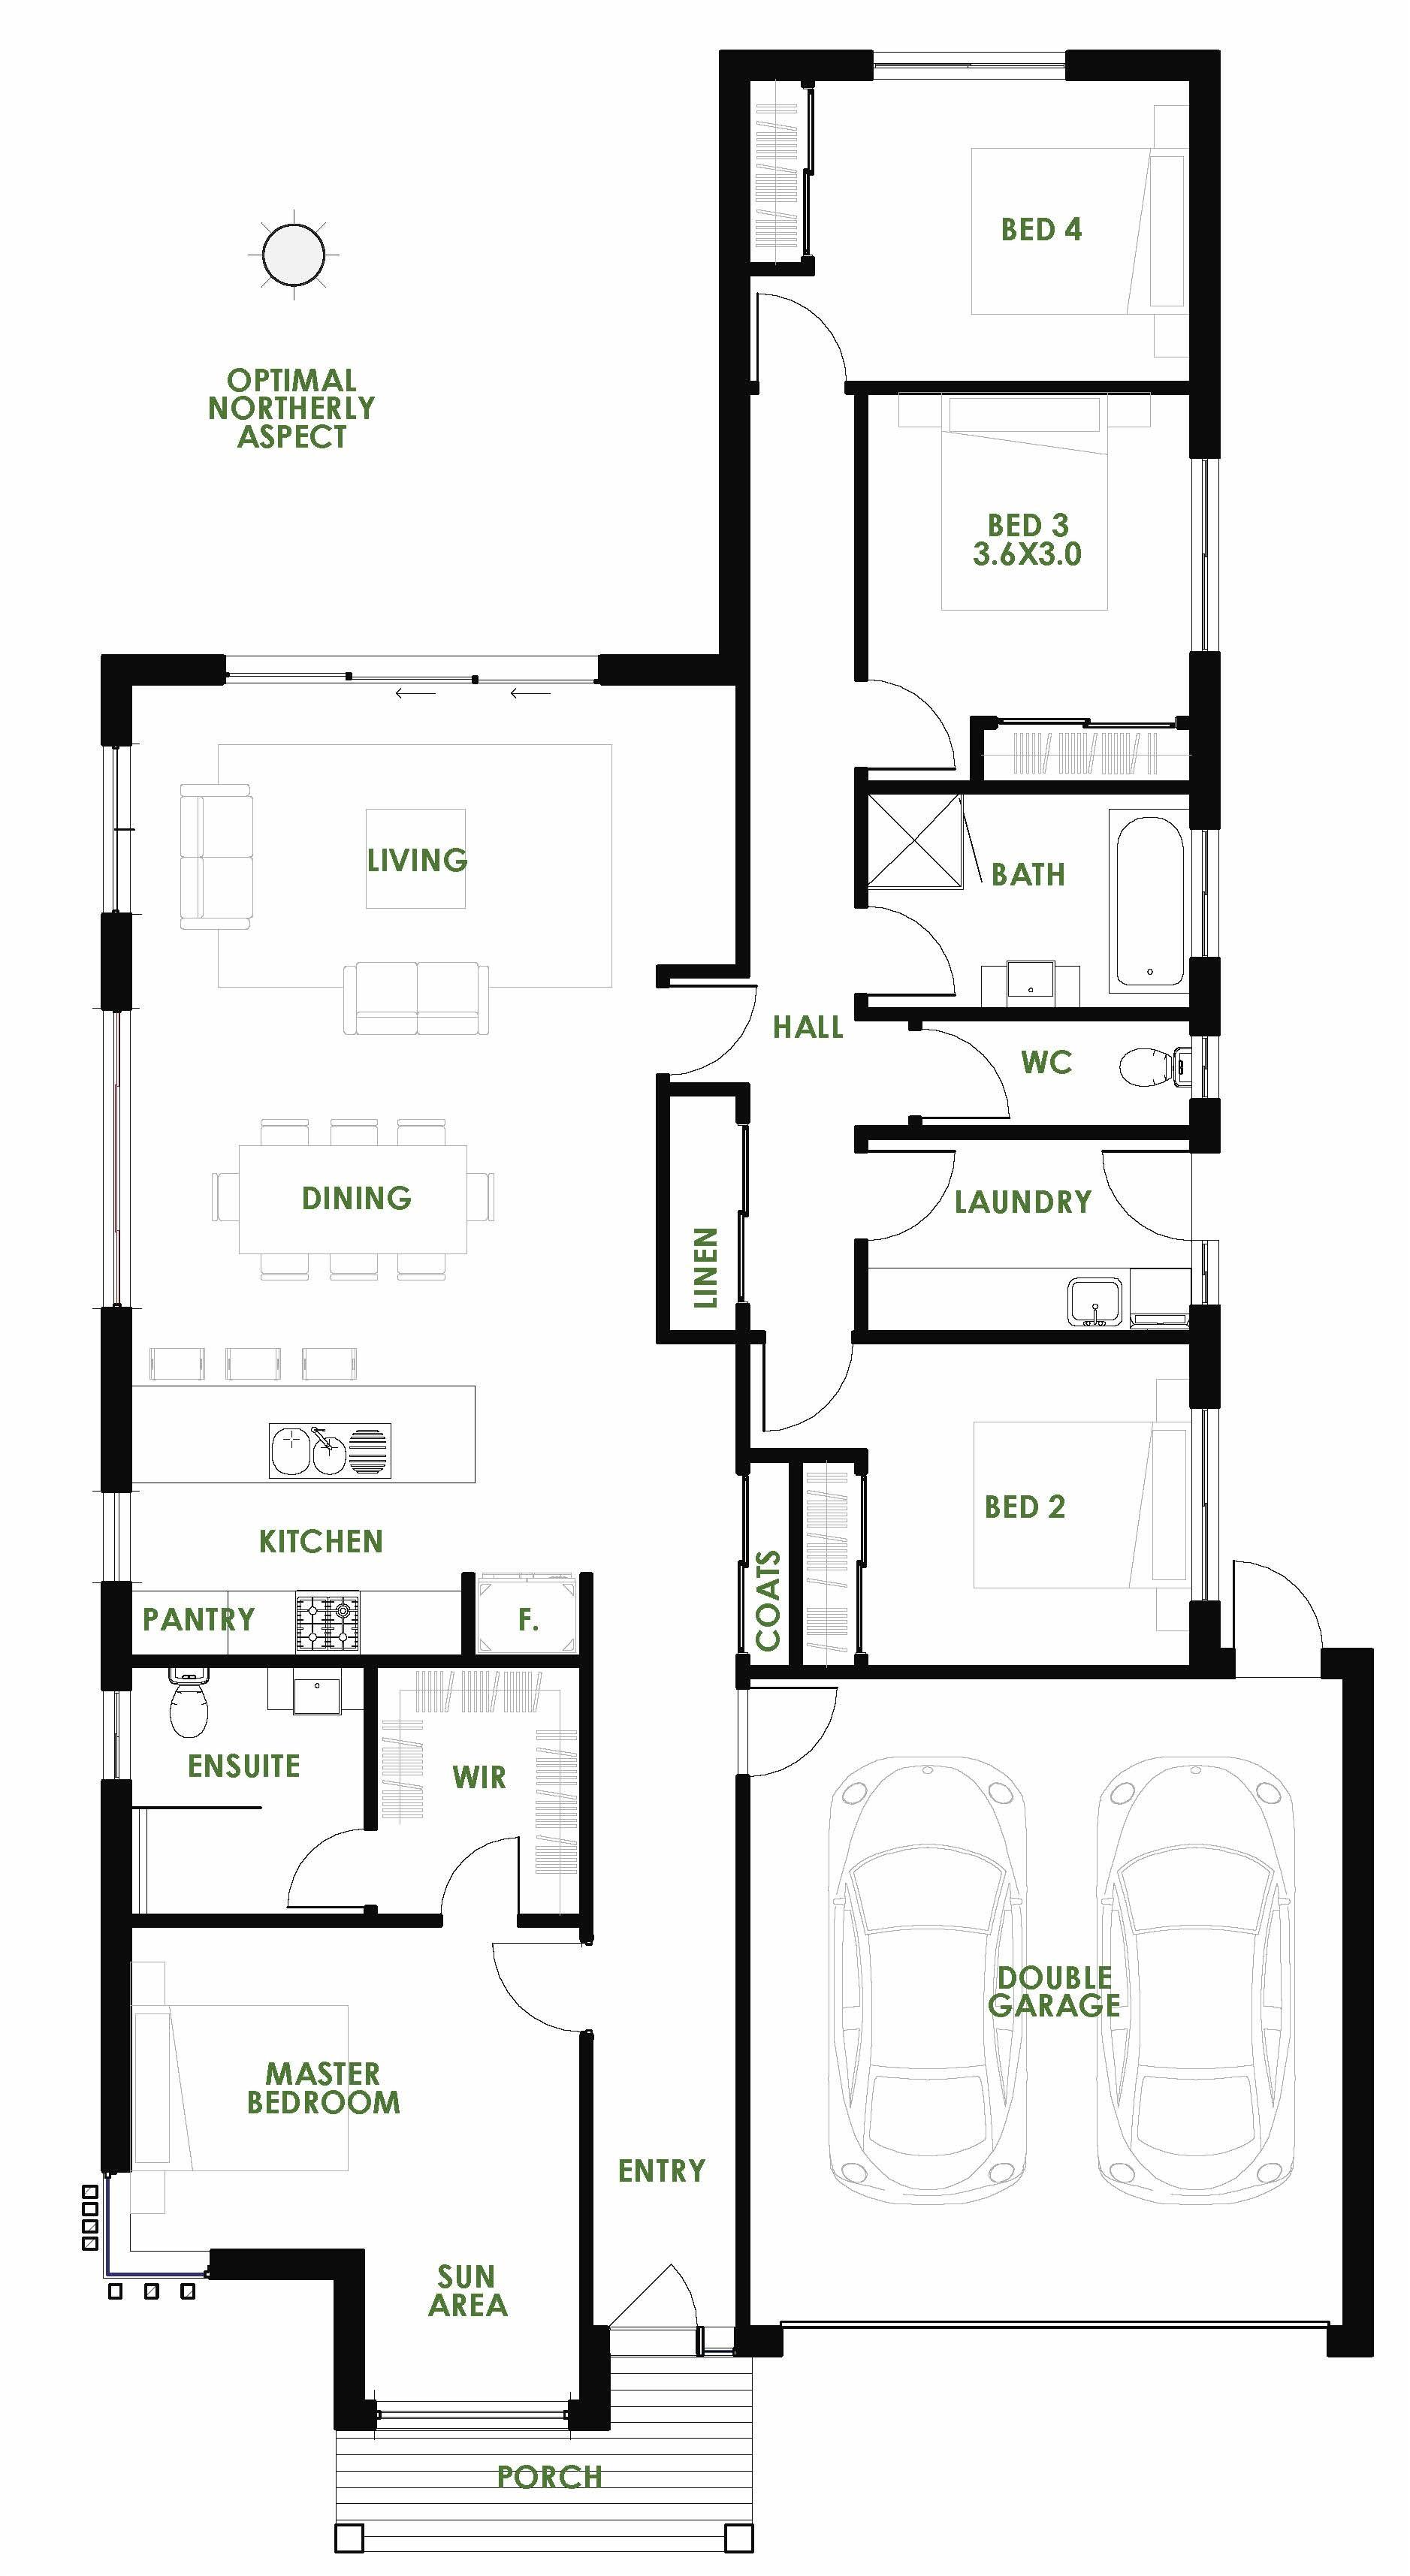 affordable home plans fancy opulent best energy efficient house design cost plans most